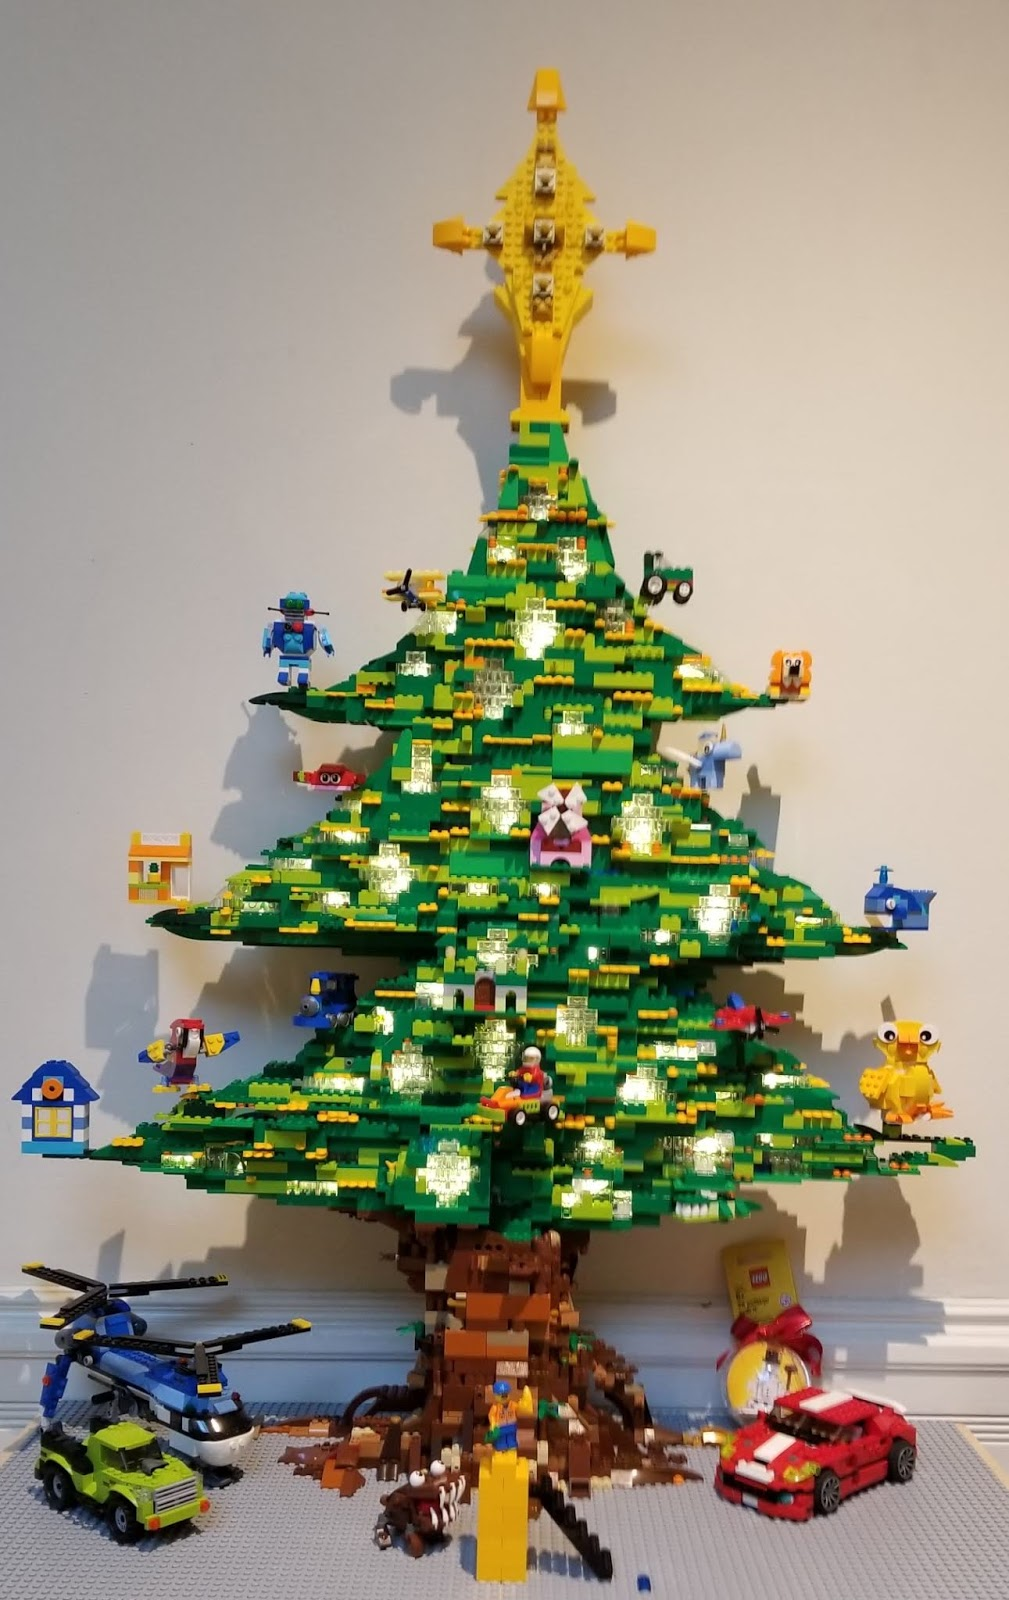 Lego Christmas.Saints John 2018 Lego Christmas Tree Project